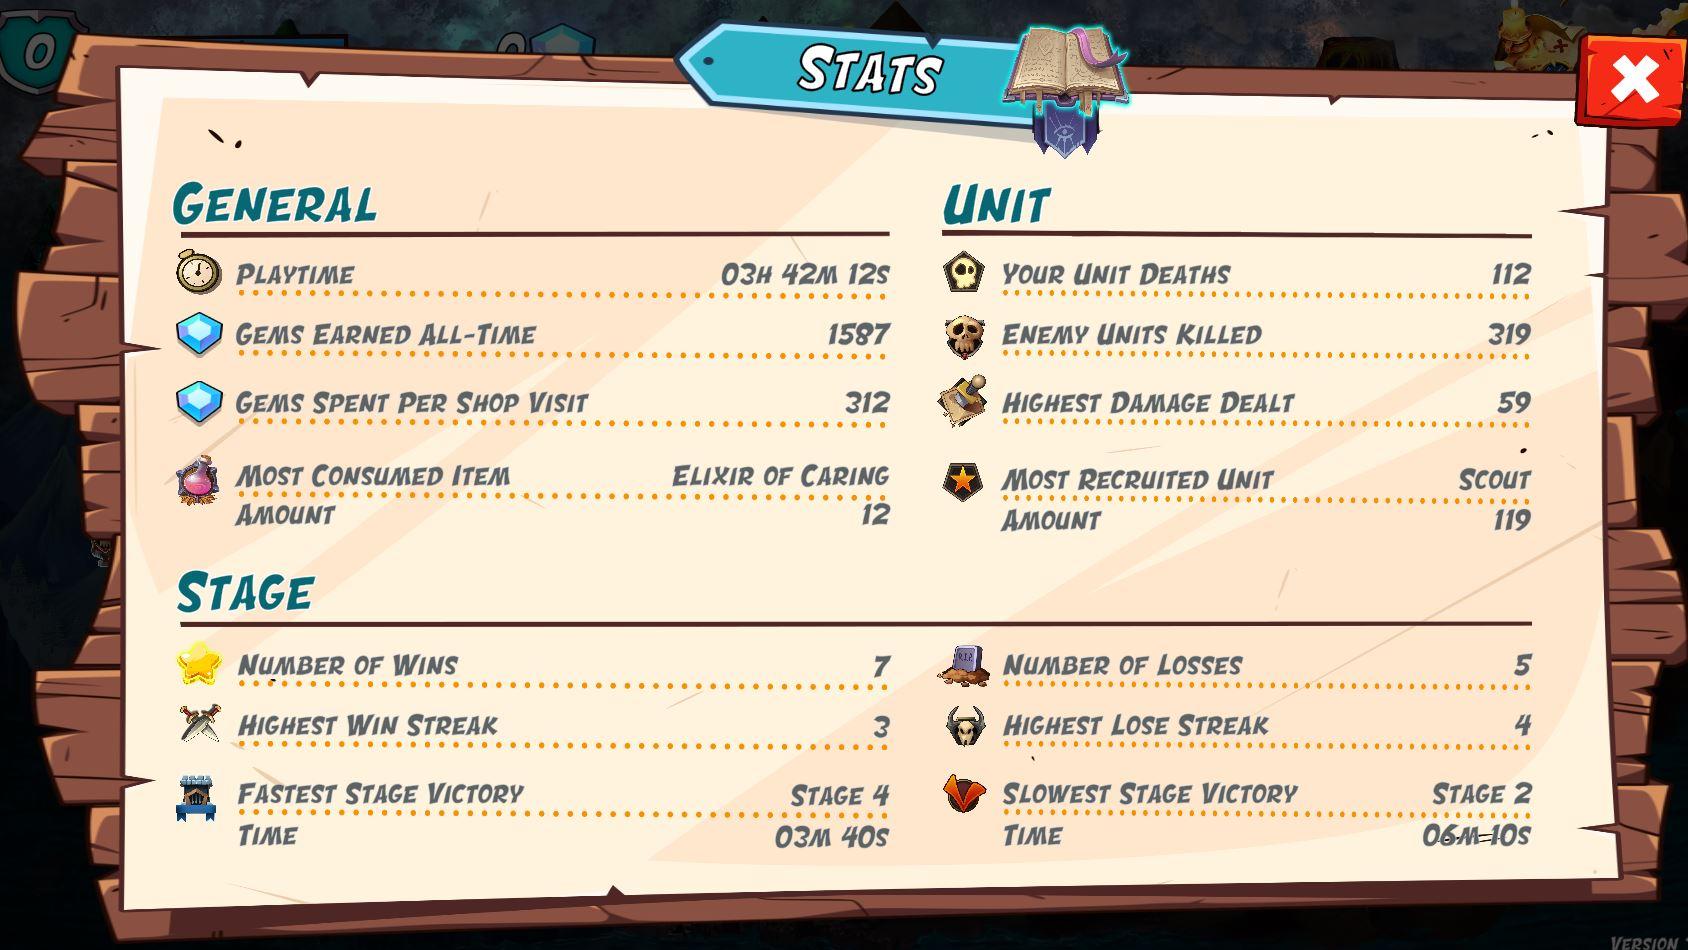 Tower Rush Stats menu